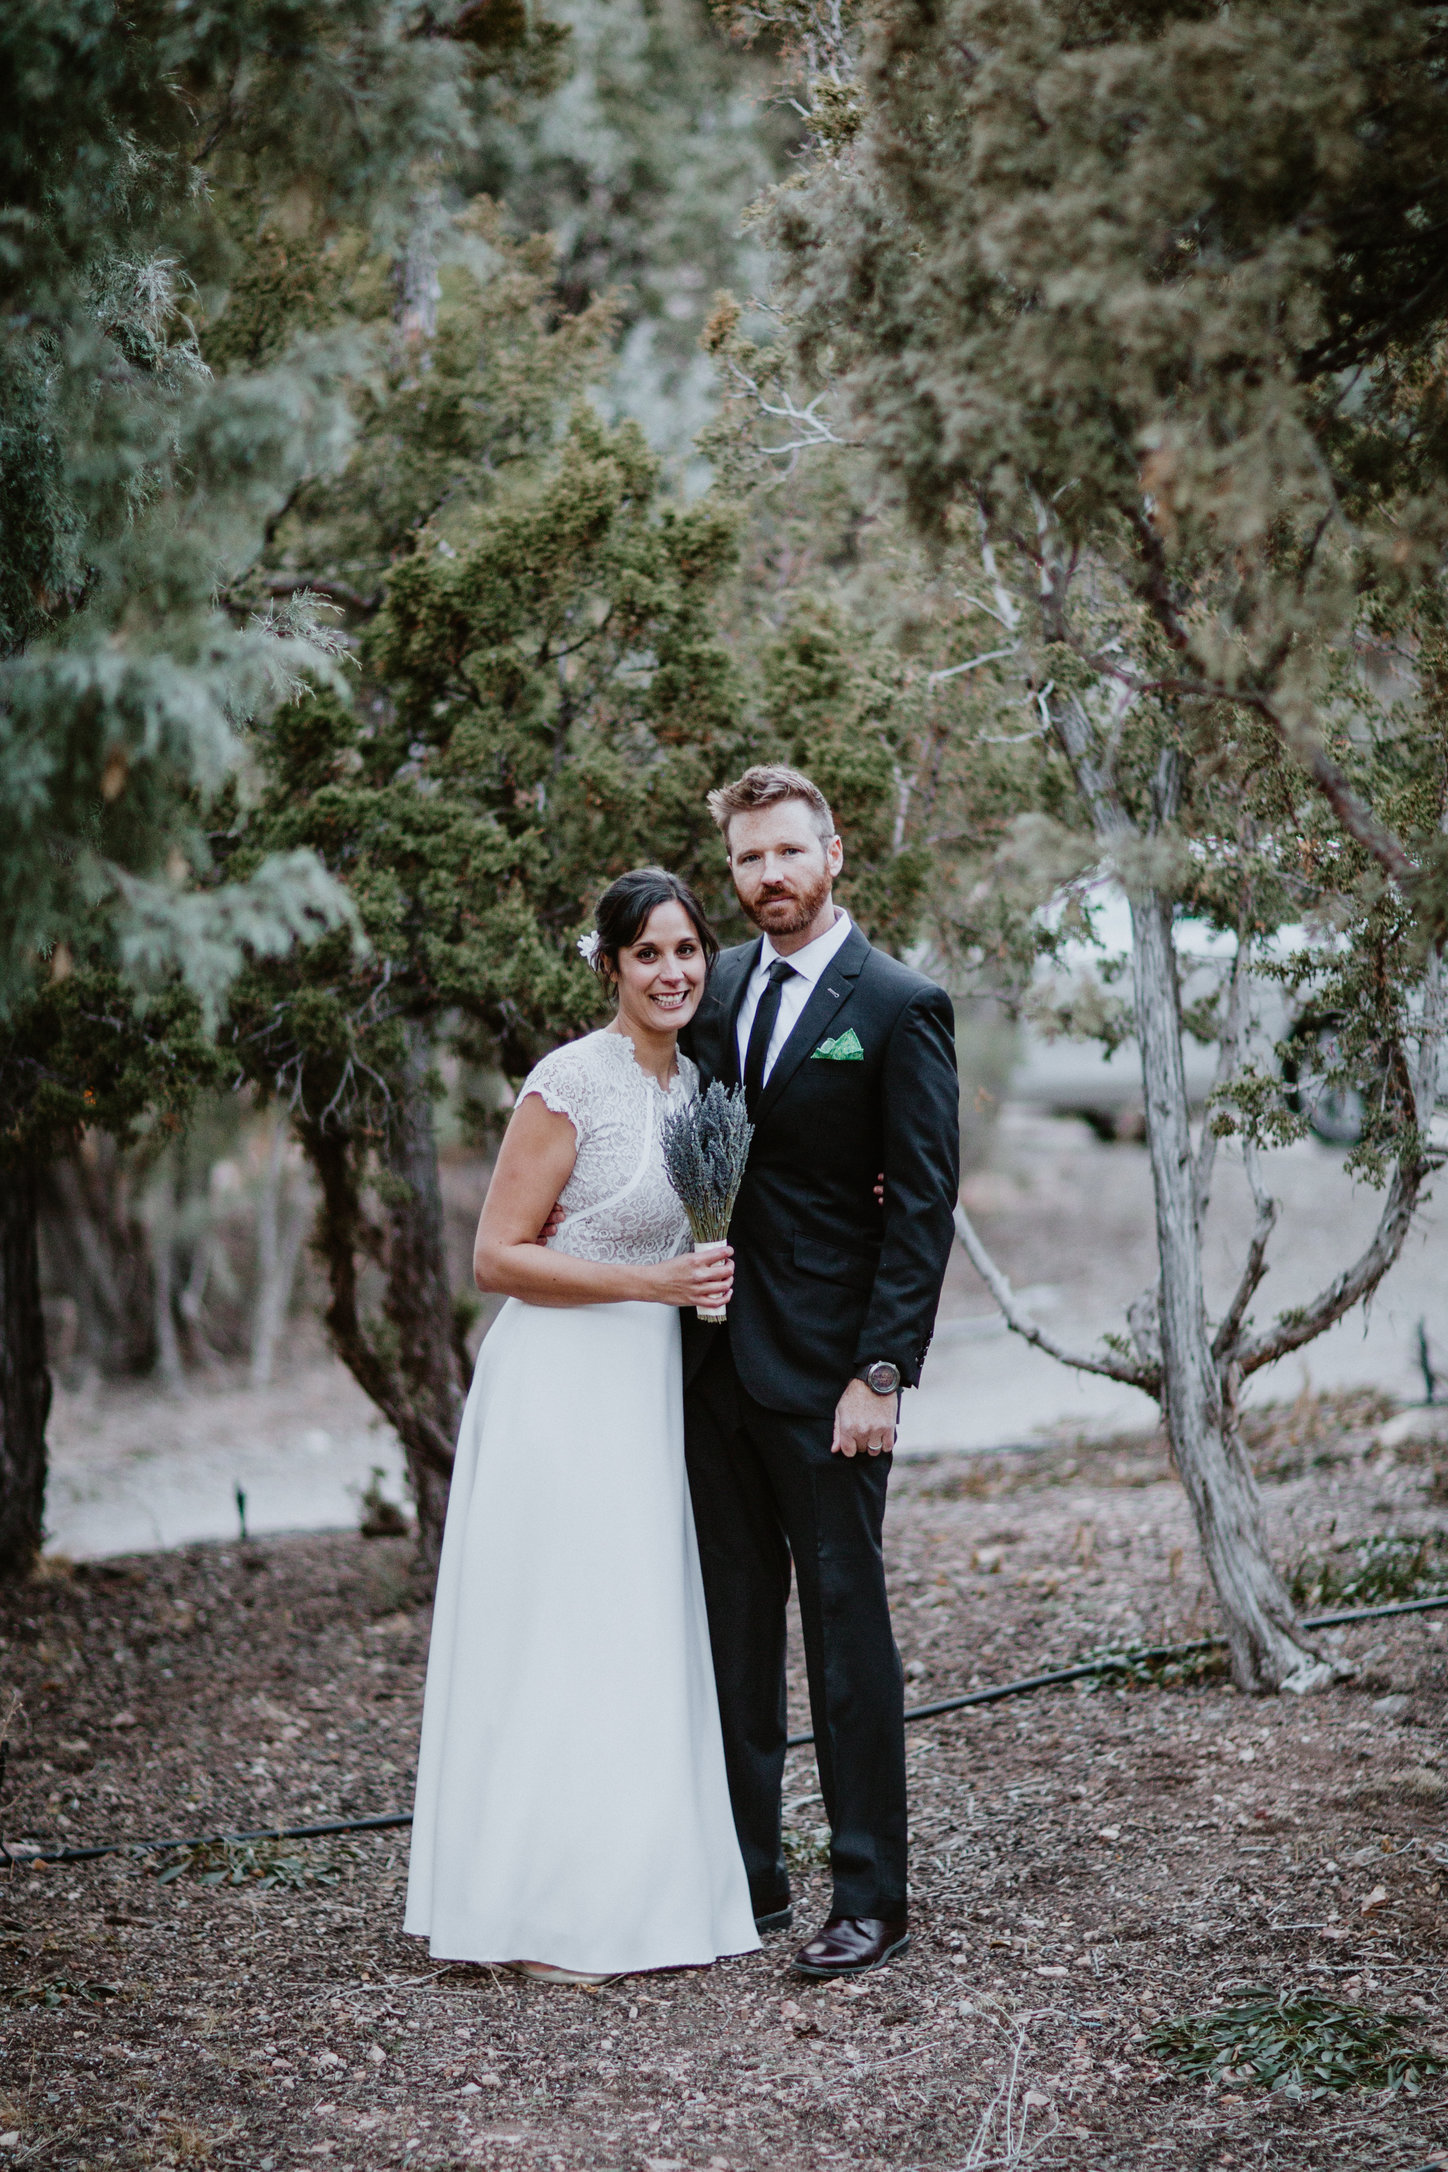 HandM-wedding-147.jpg